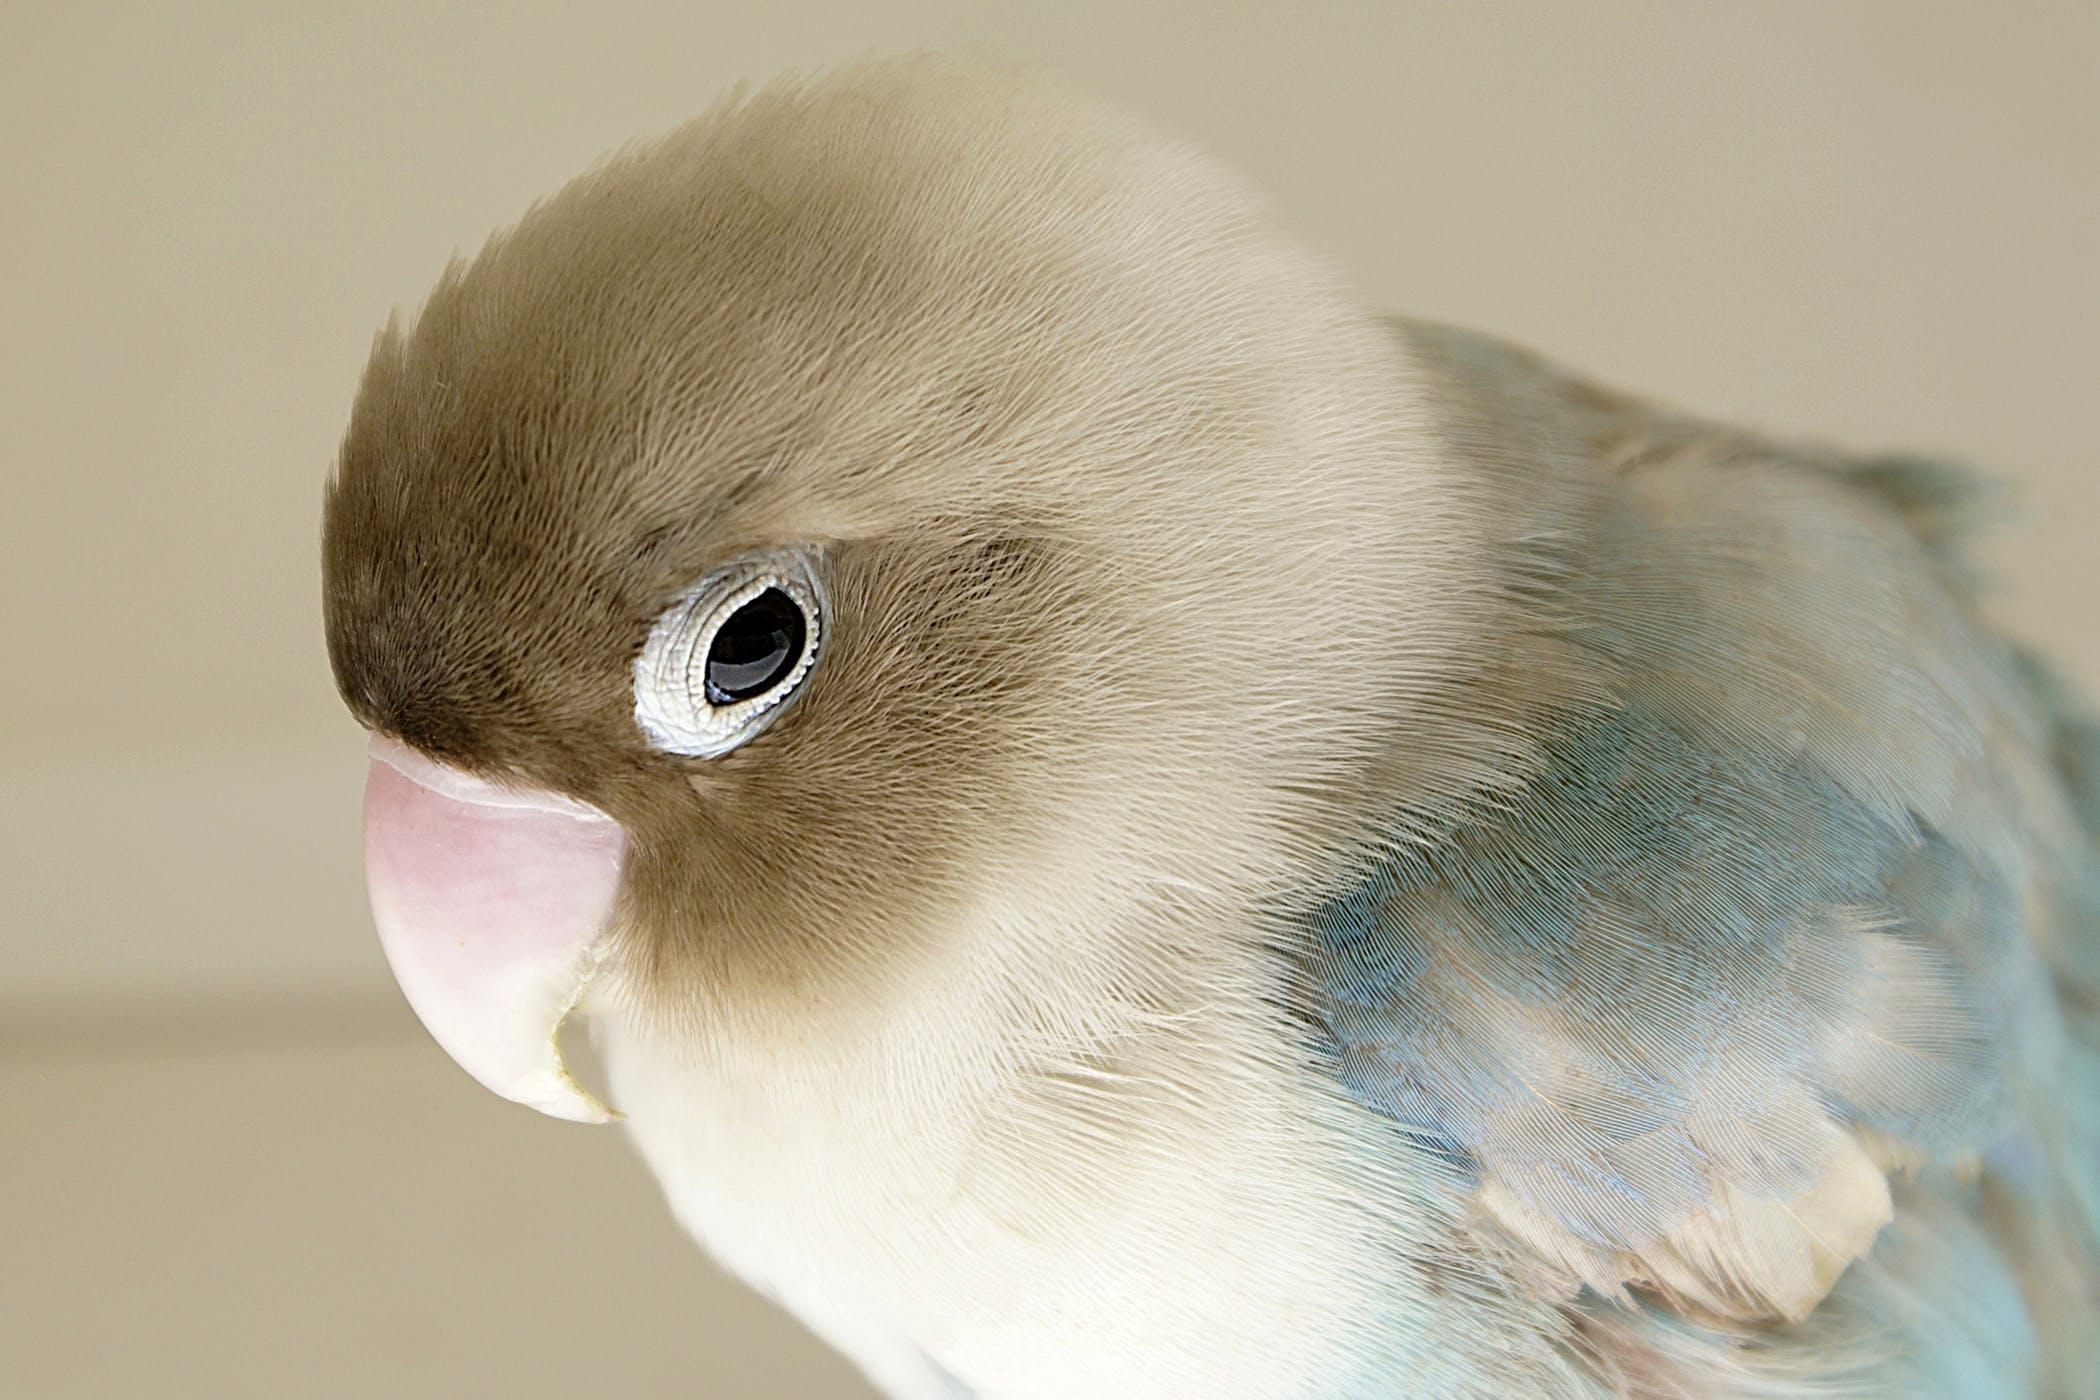 bird with papillomavirus metastatic cancer neck lump